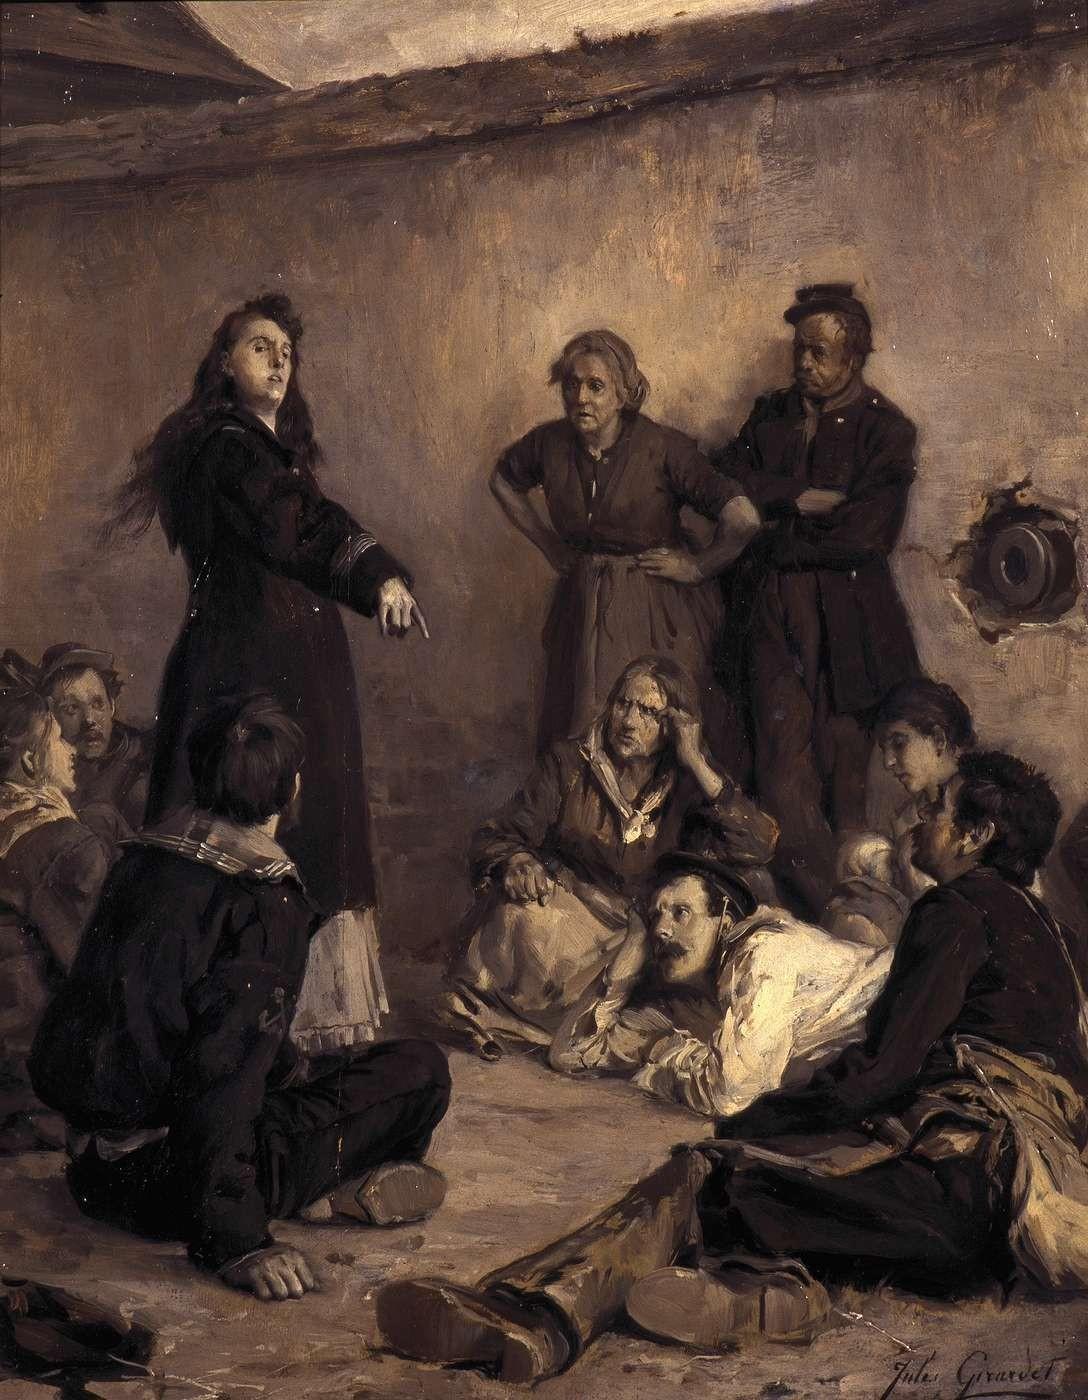 Jules Girardet, Louise Michel à Satory, 1871.